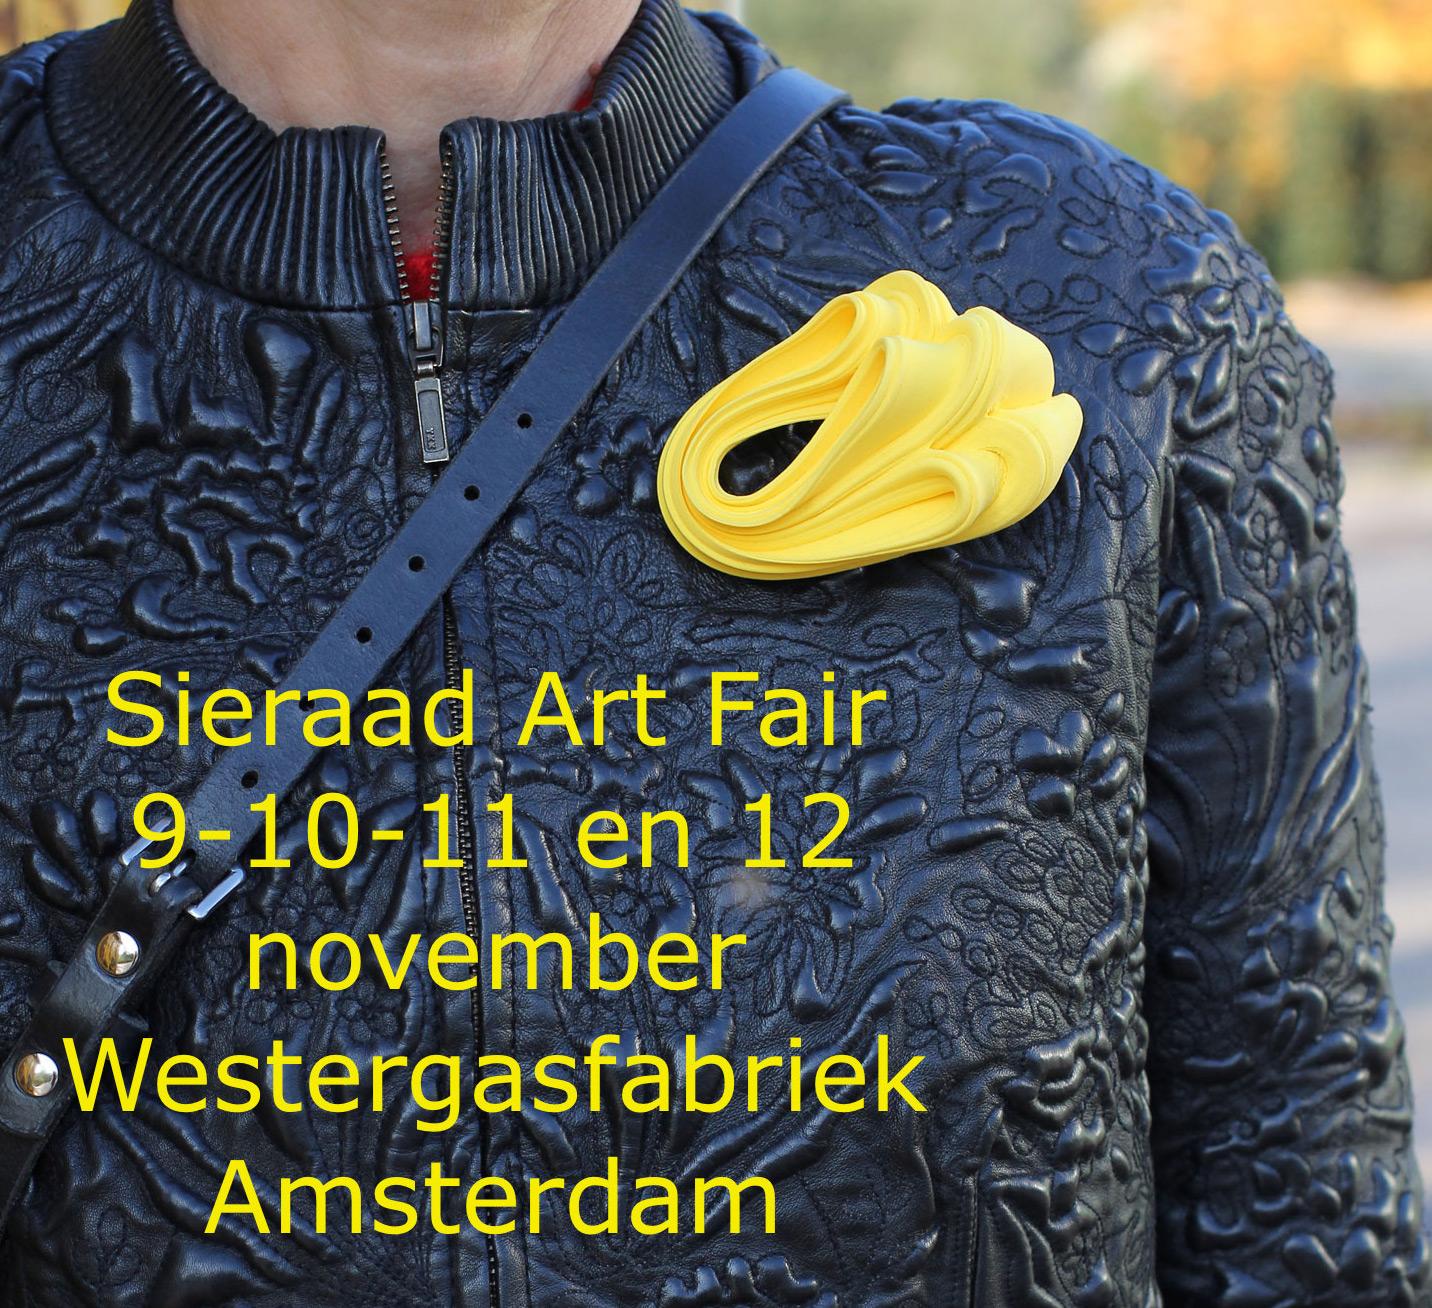 Sieraad Art Fair 2017 Westergasfabriek Amsterdam